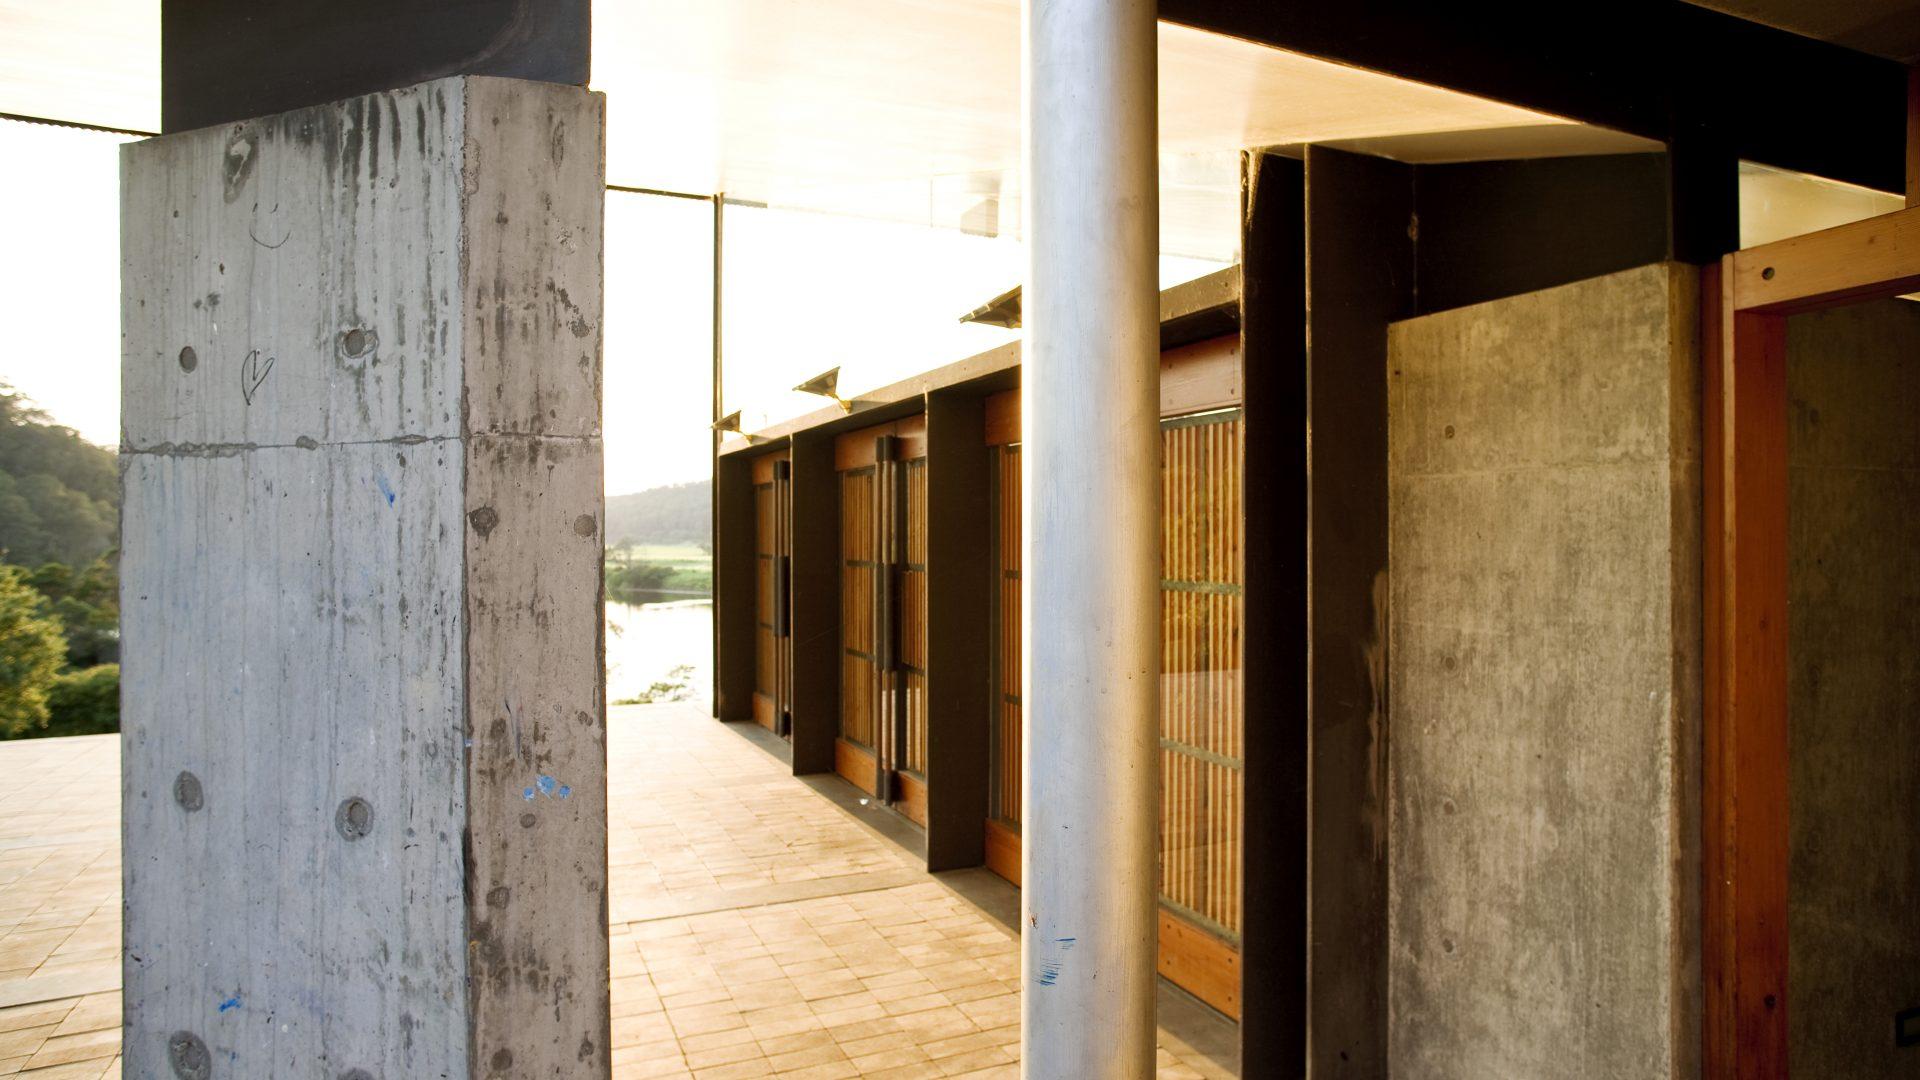 A concrete pylon and concrete wall behind